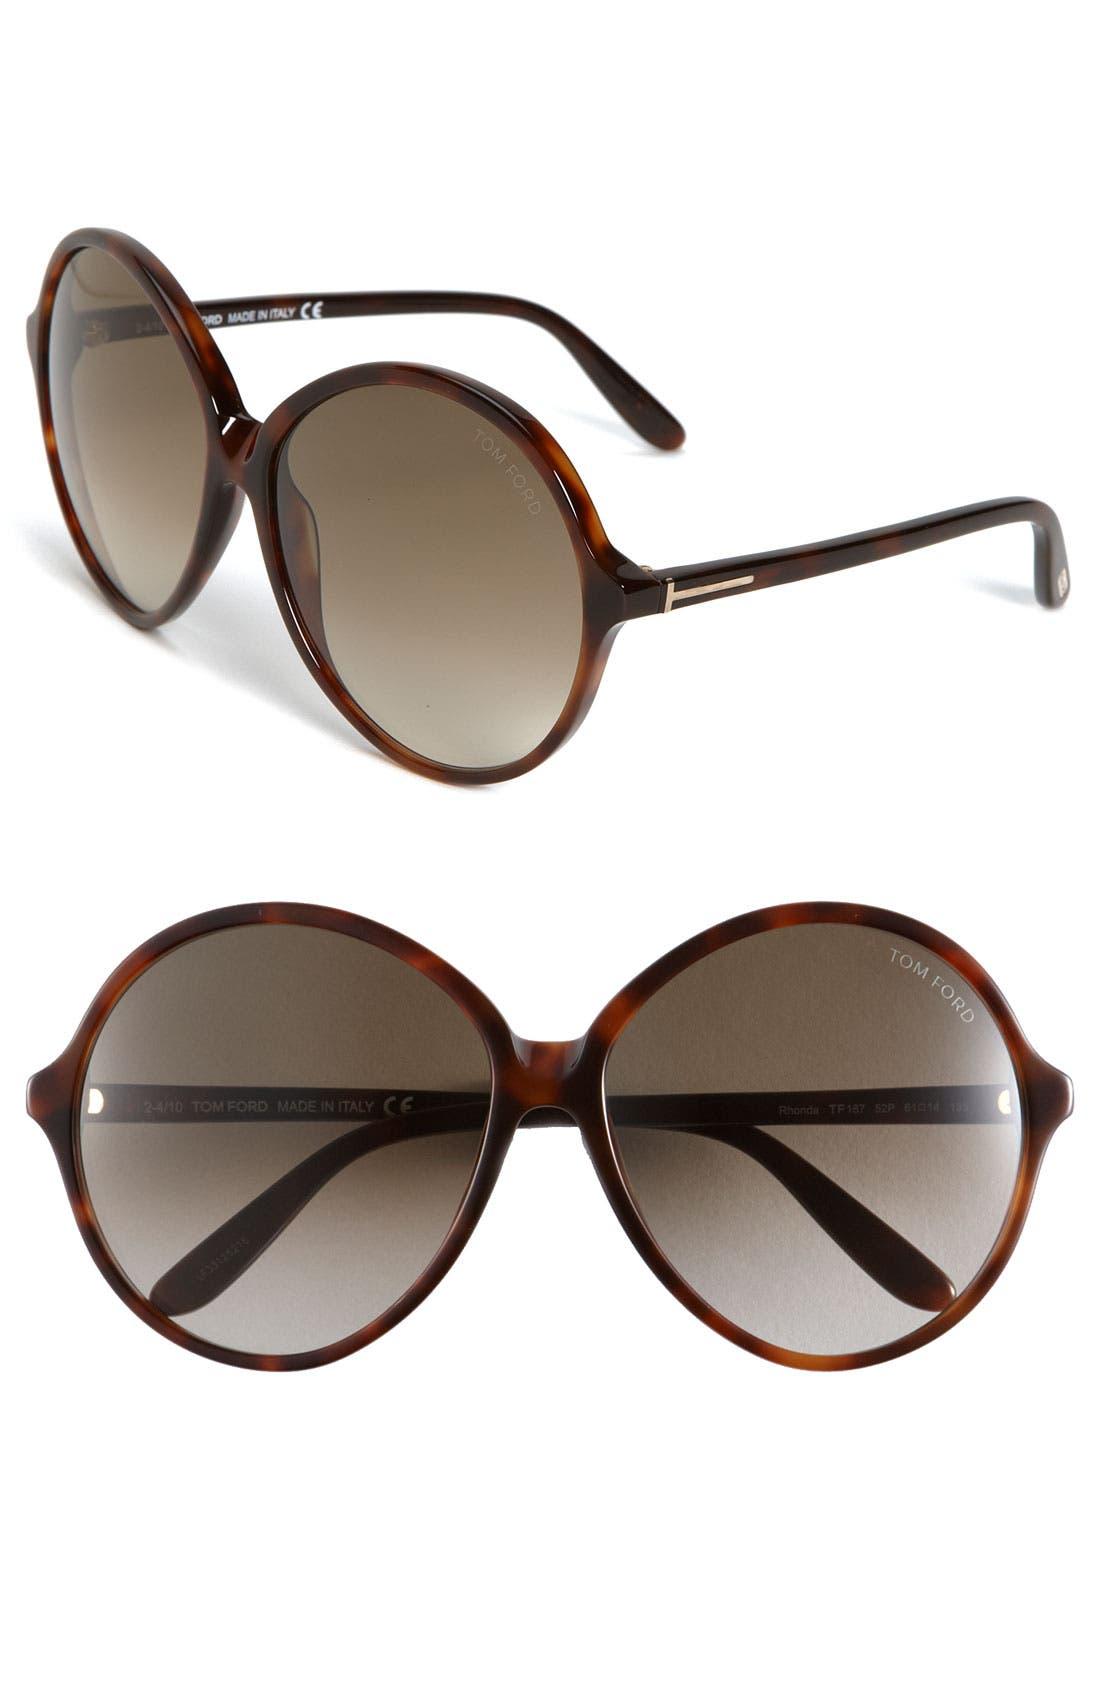 Alternate Image 1 Selected - Tom Ford 'Rhonda' Round Sunglasses